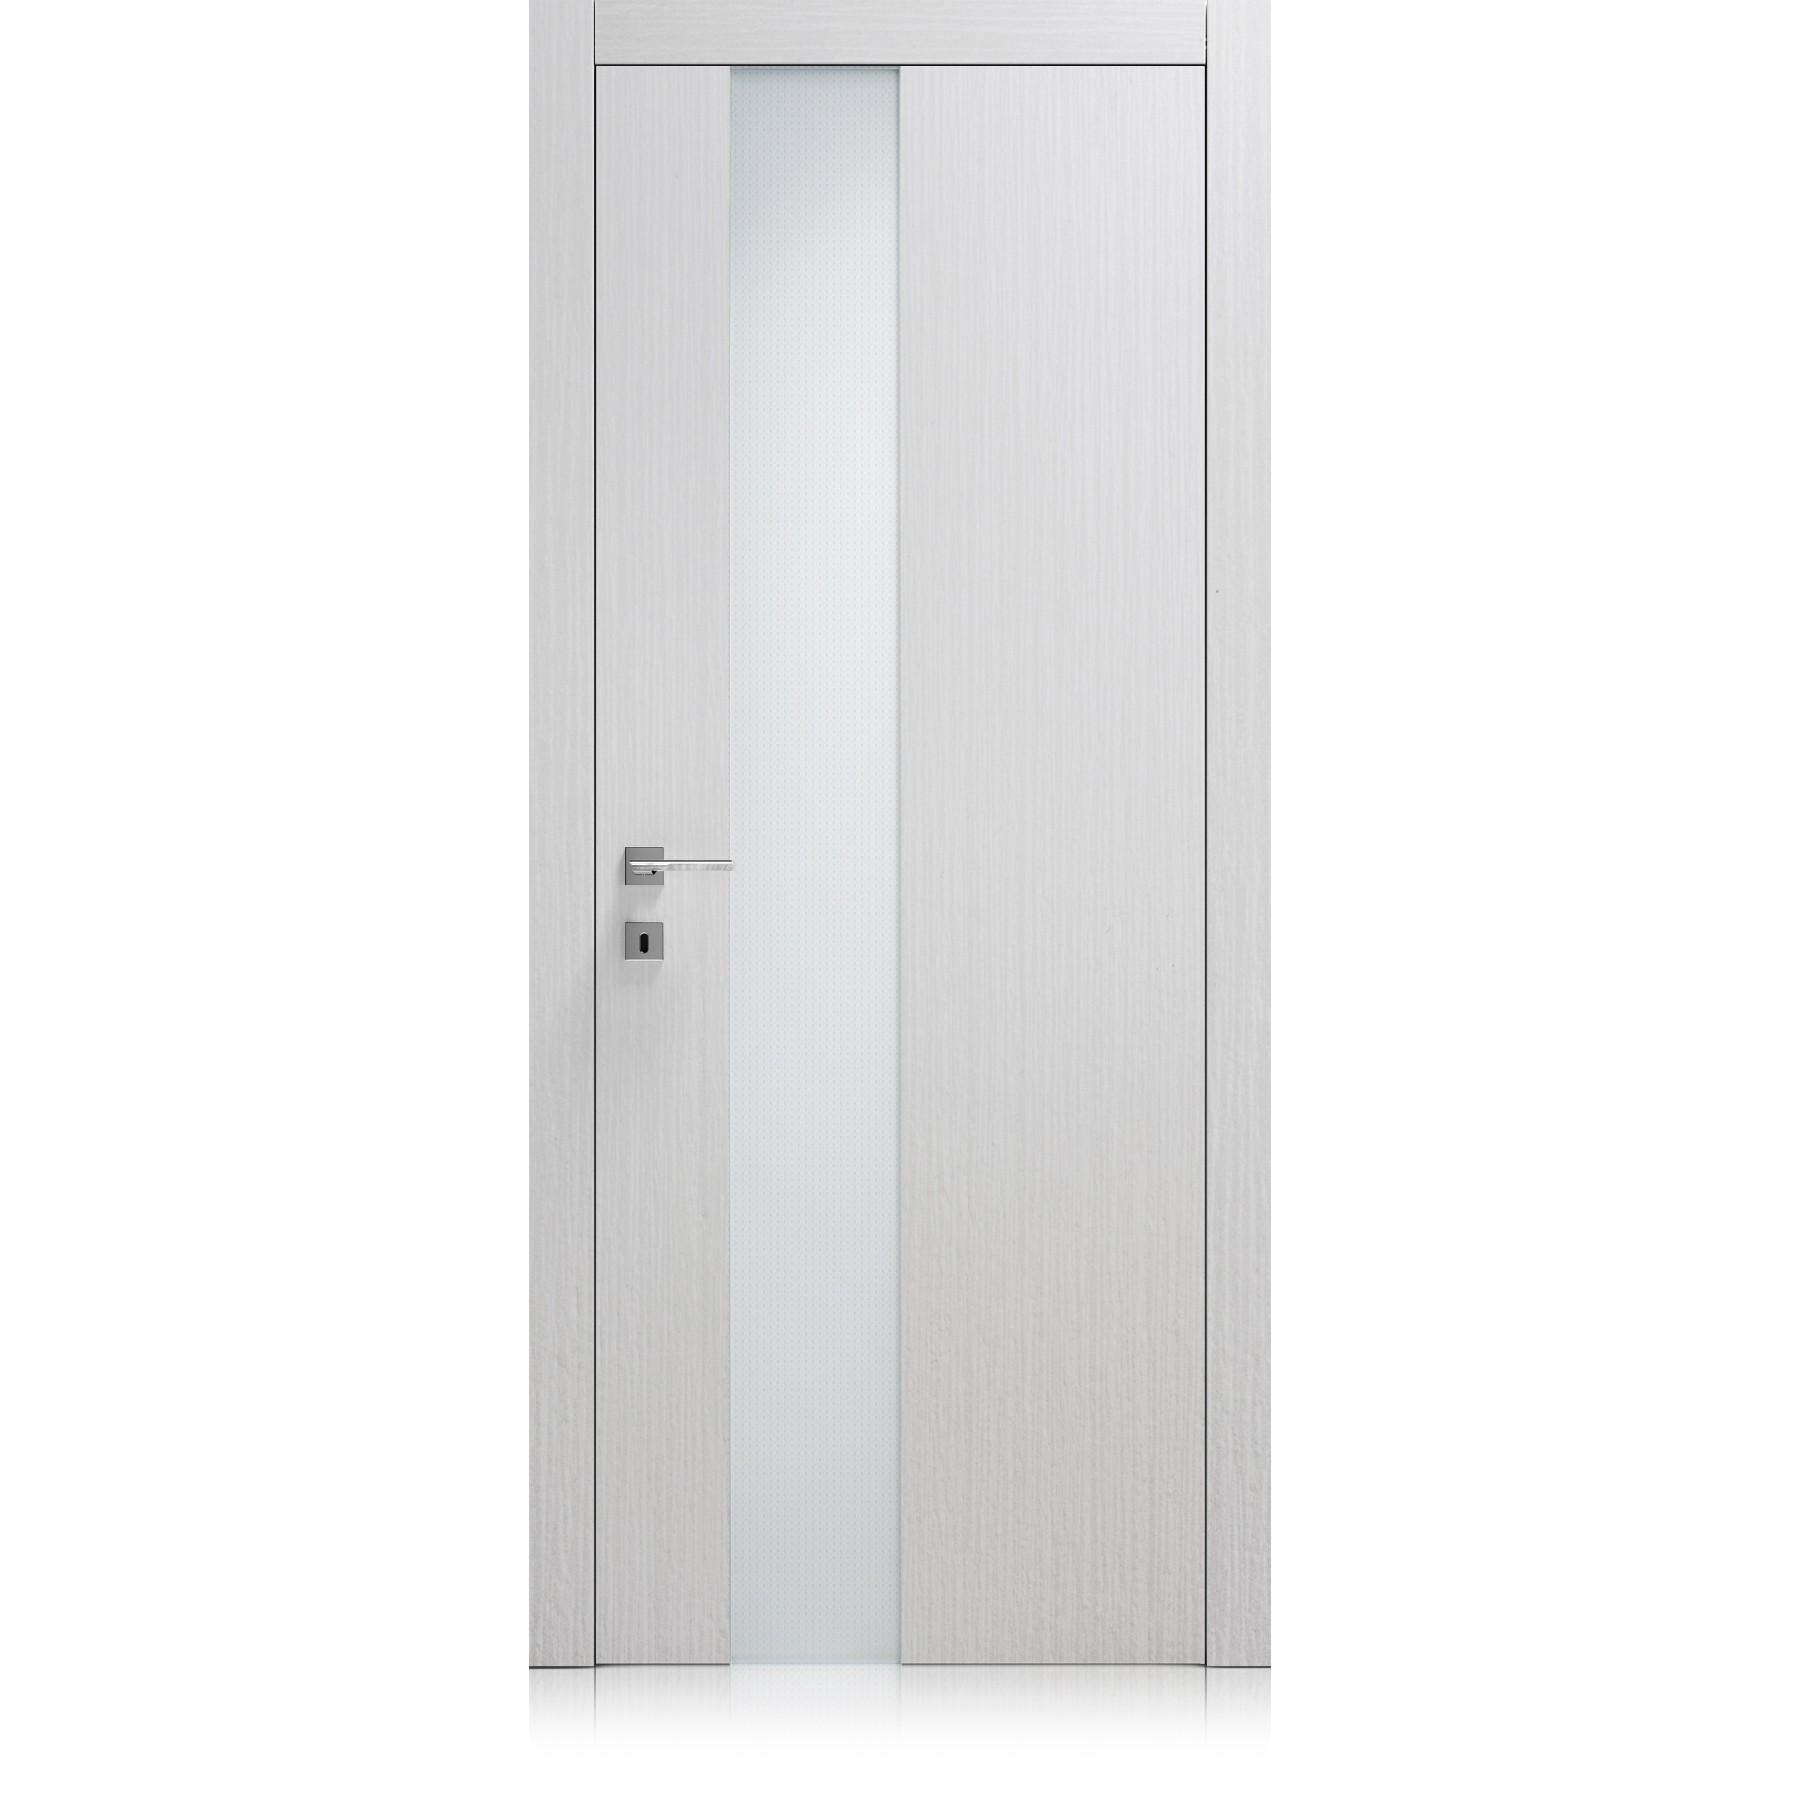 Porte Liss Vetro materic bianco